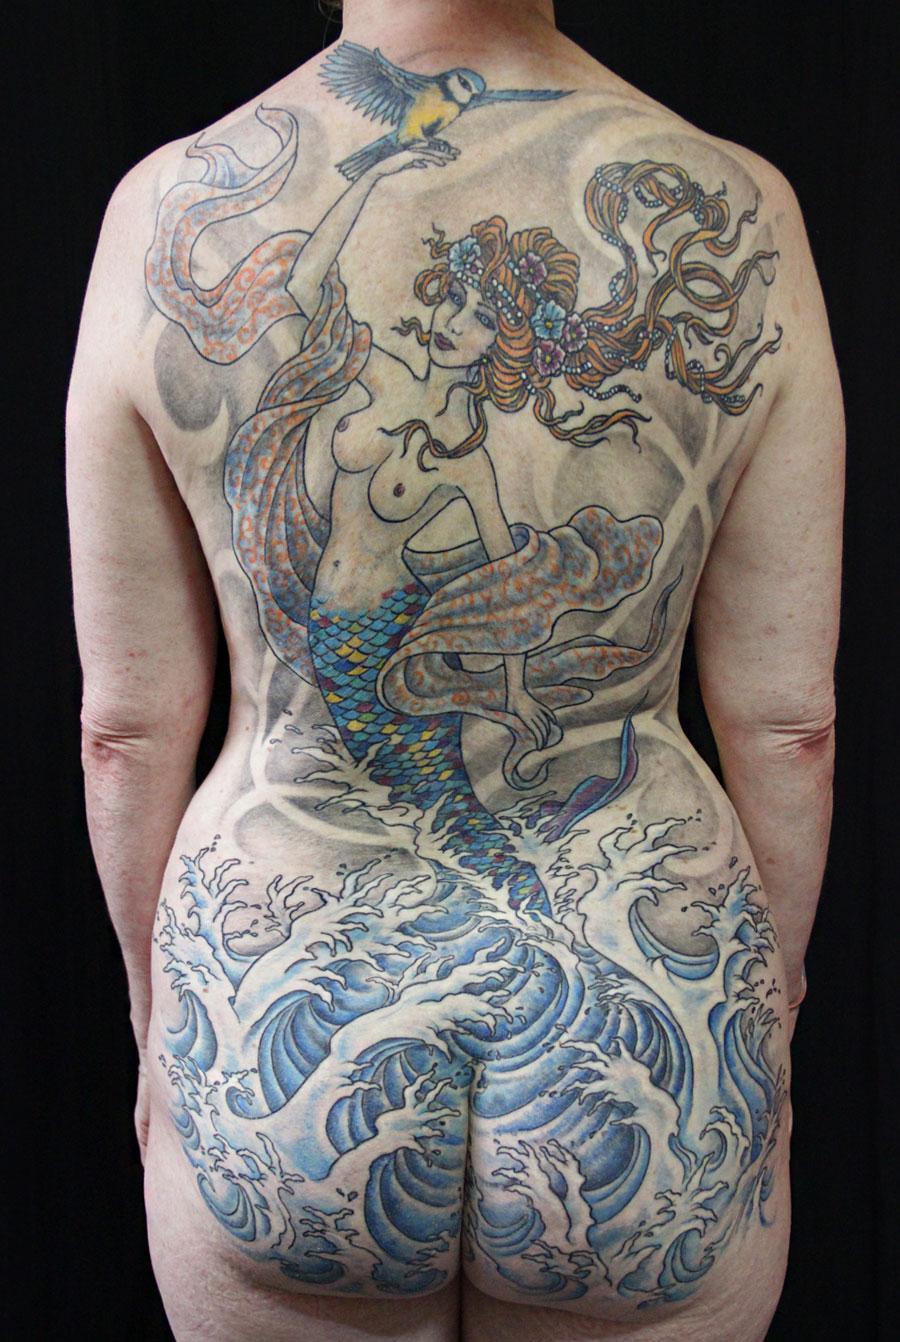 12-aldos-tattoo sirene